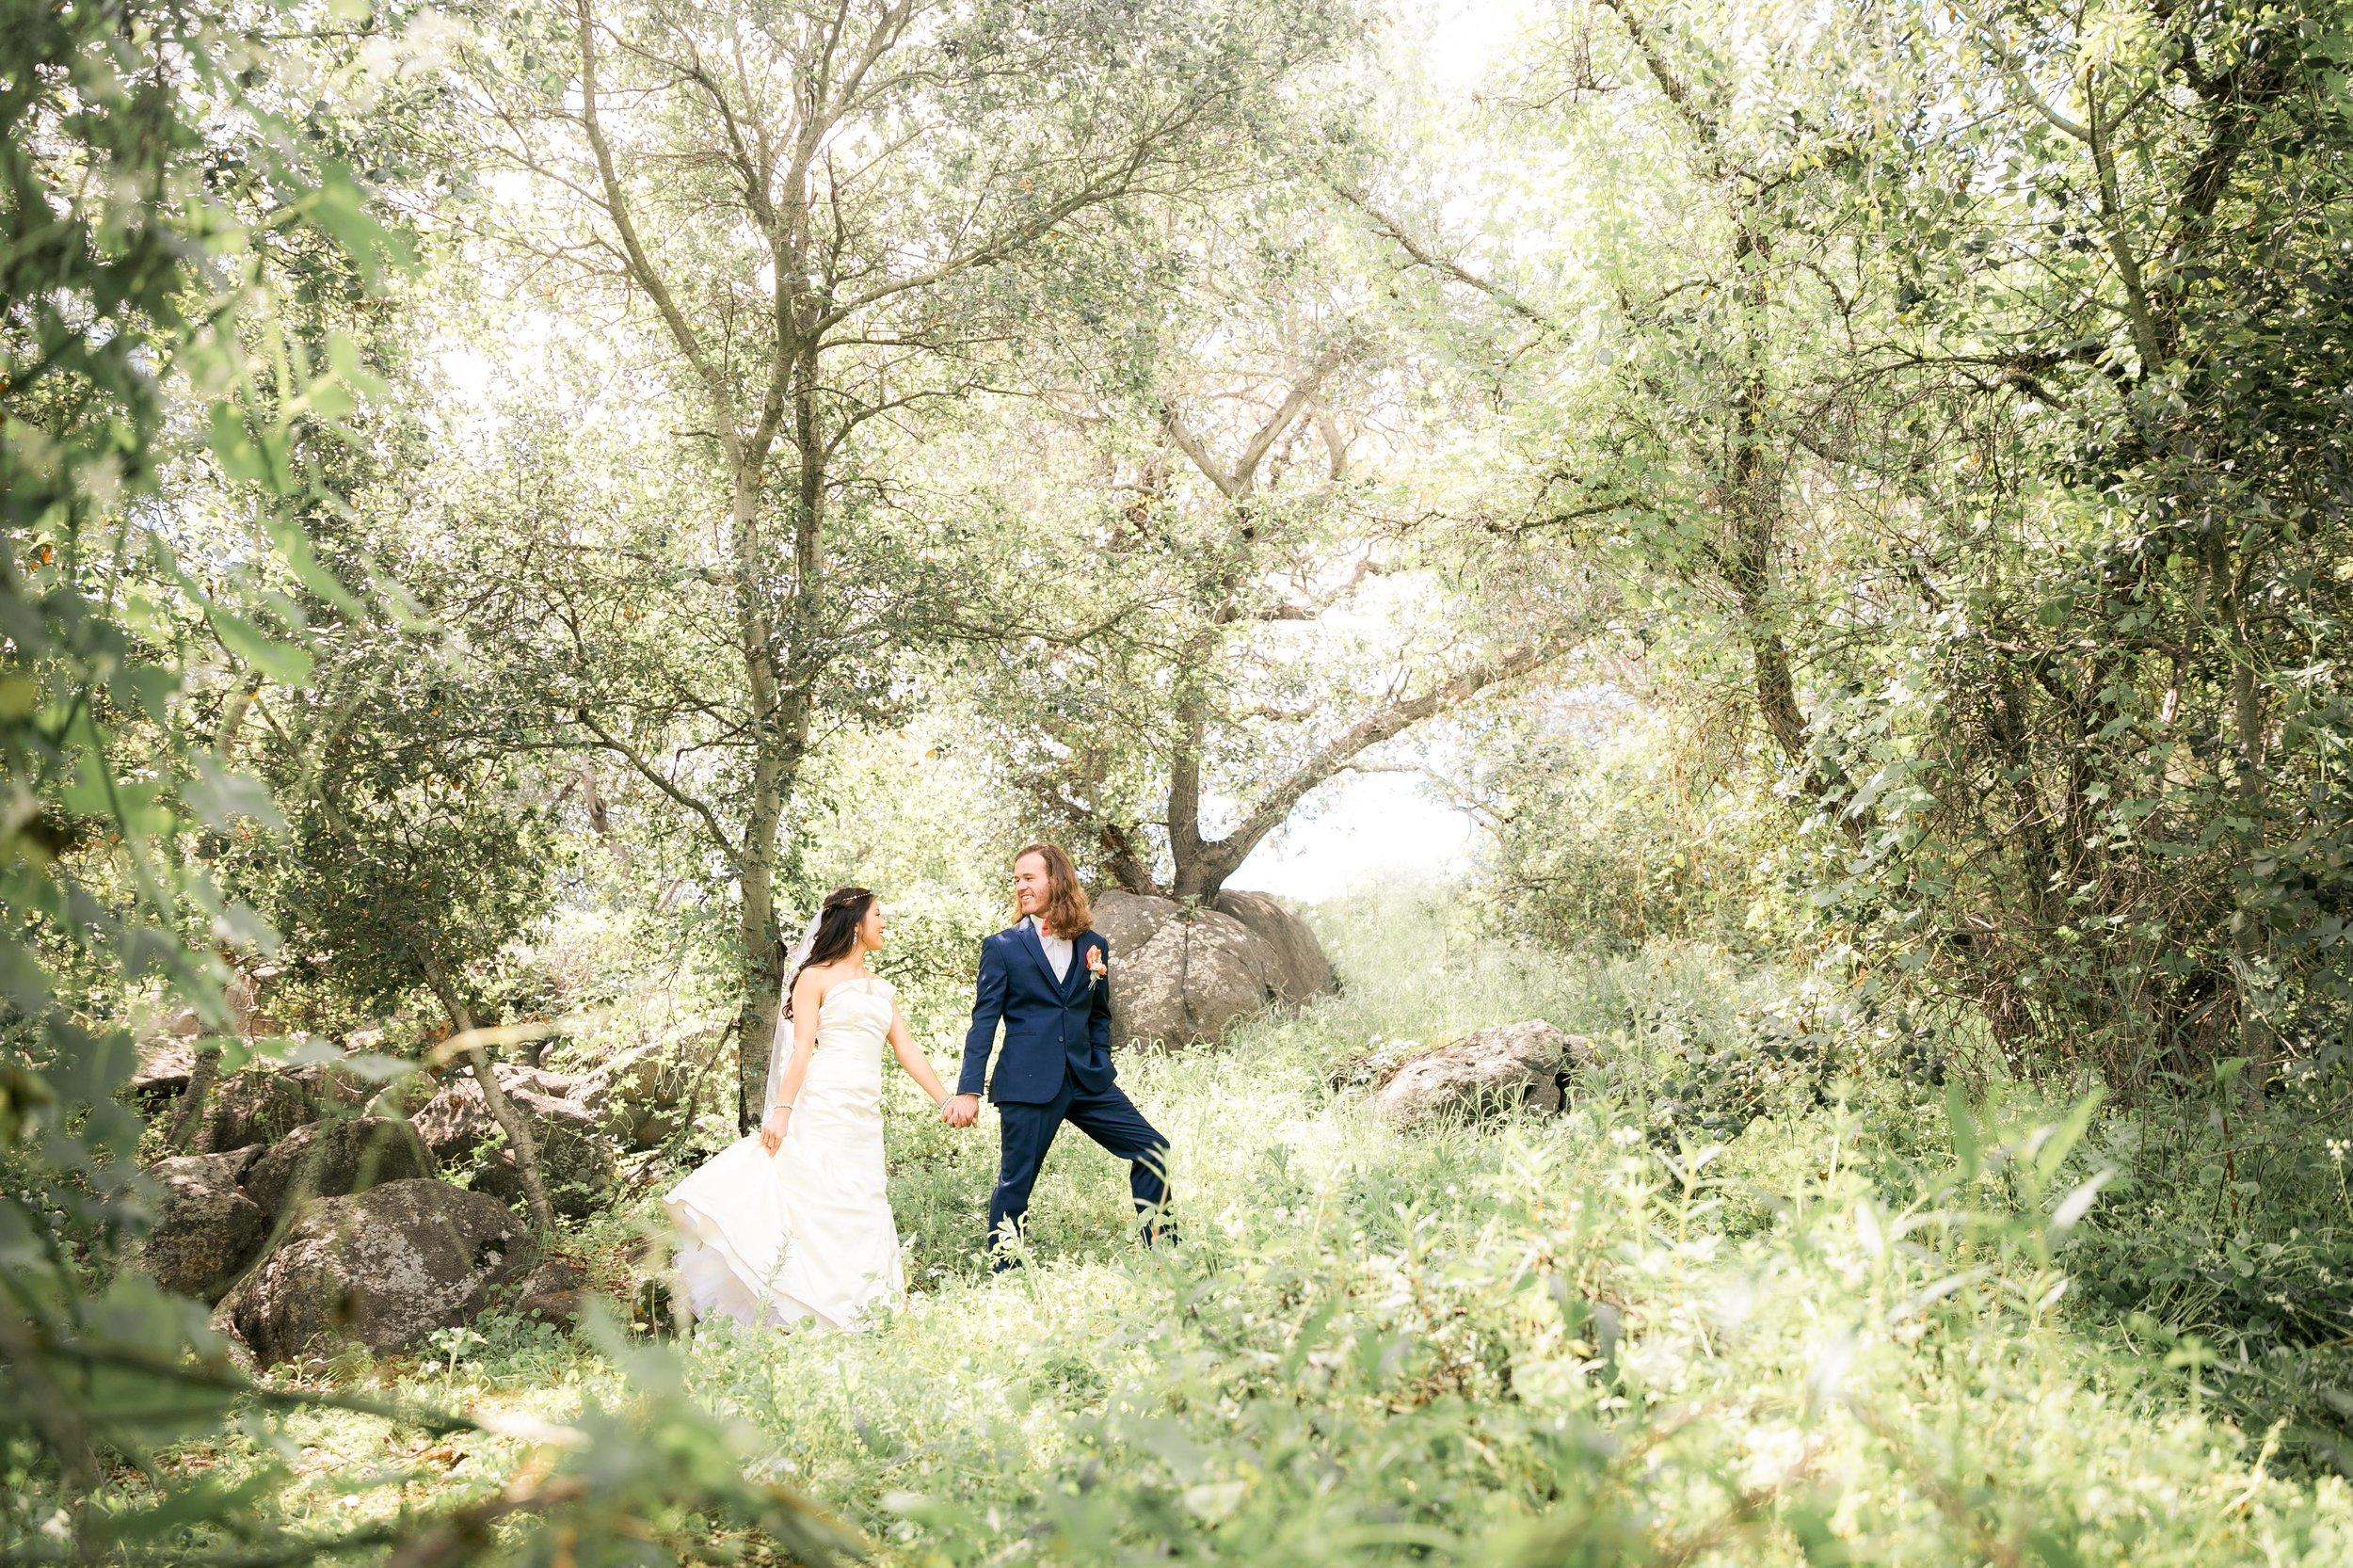 southern_california_wedding_joshuachun_photography_portraits-12.JPG